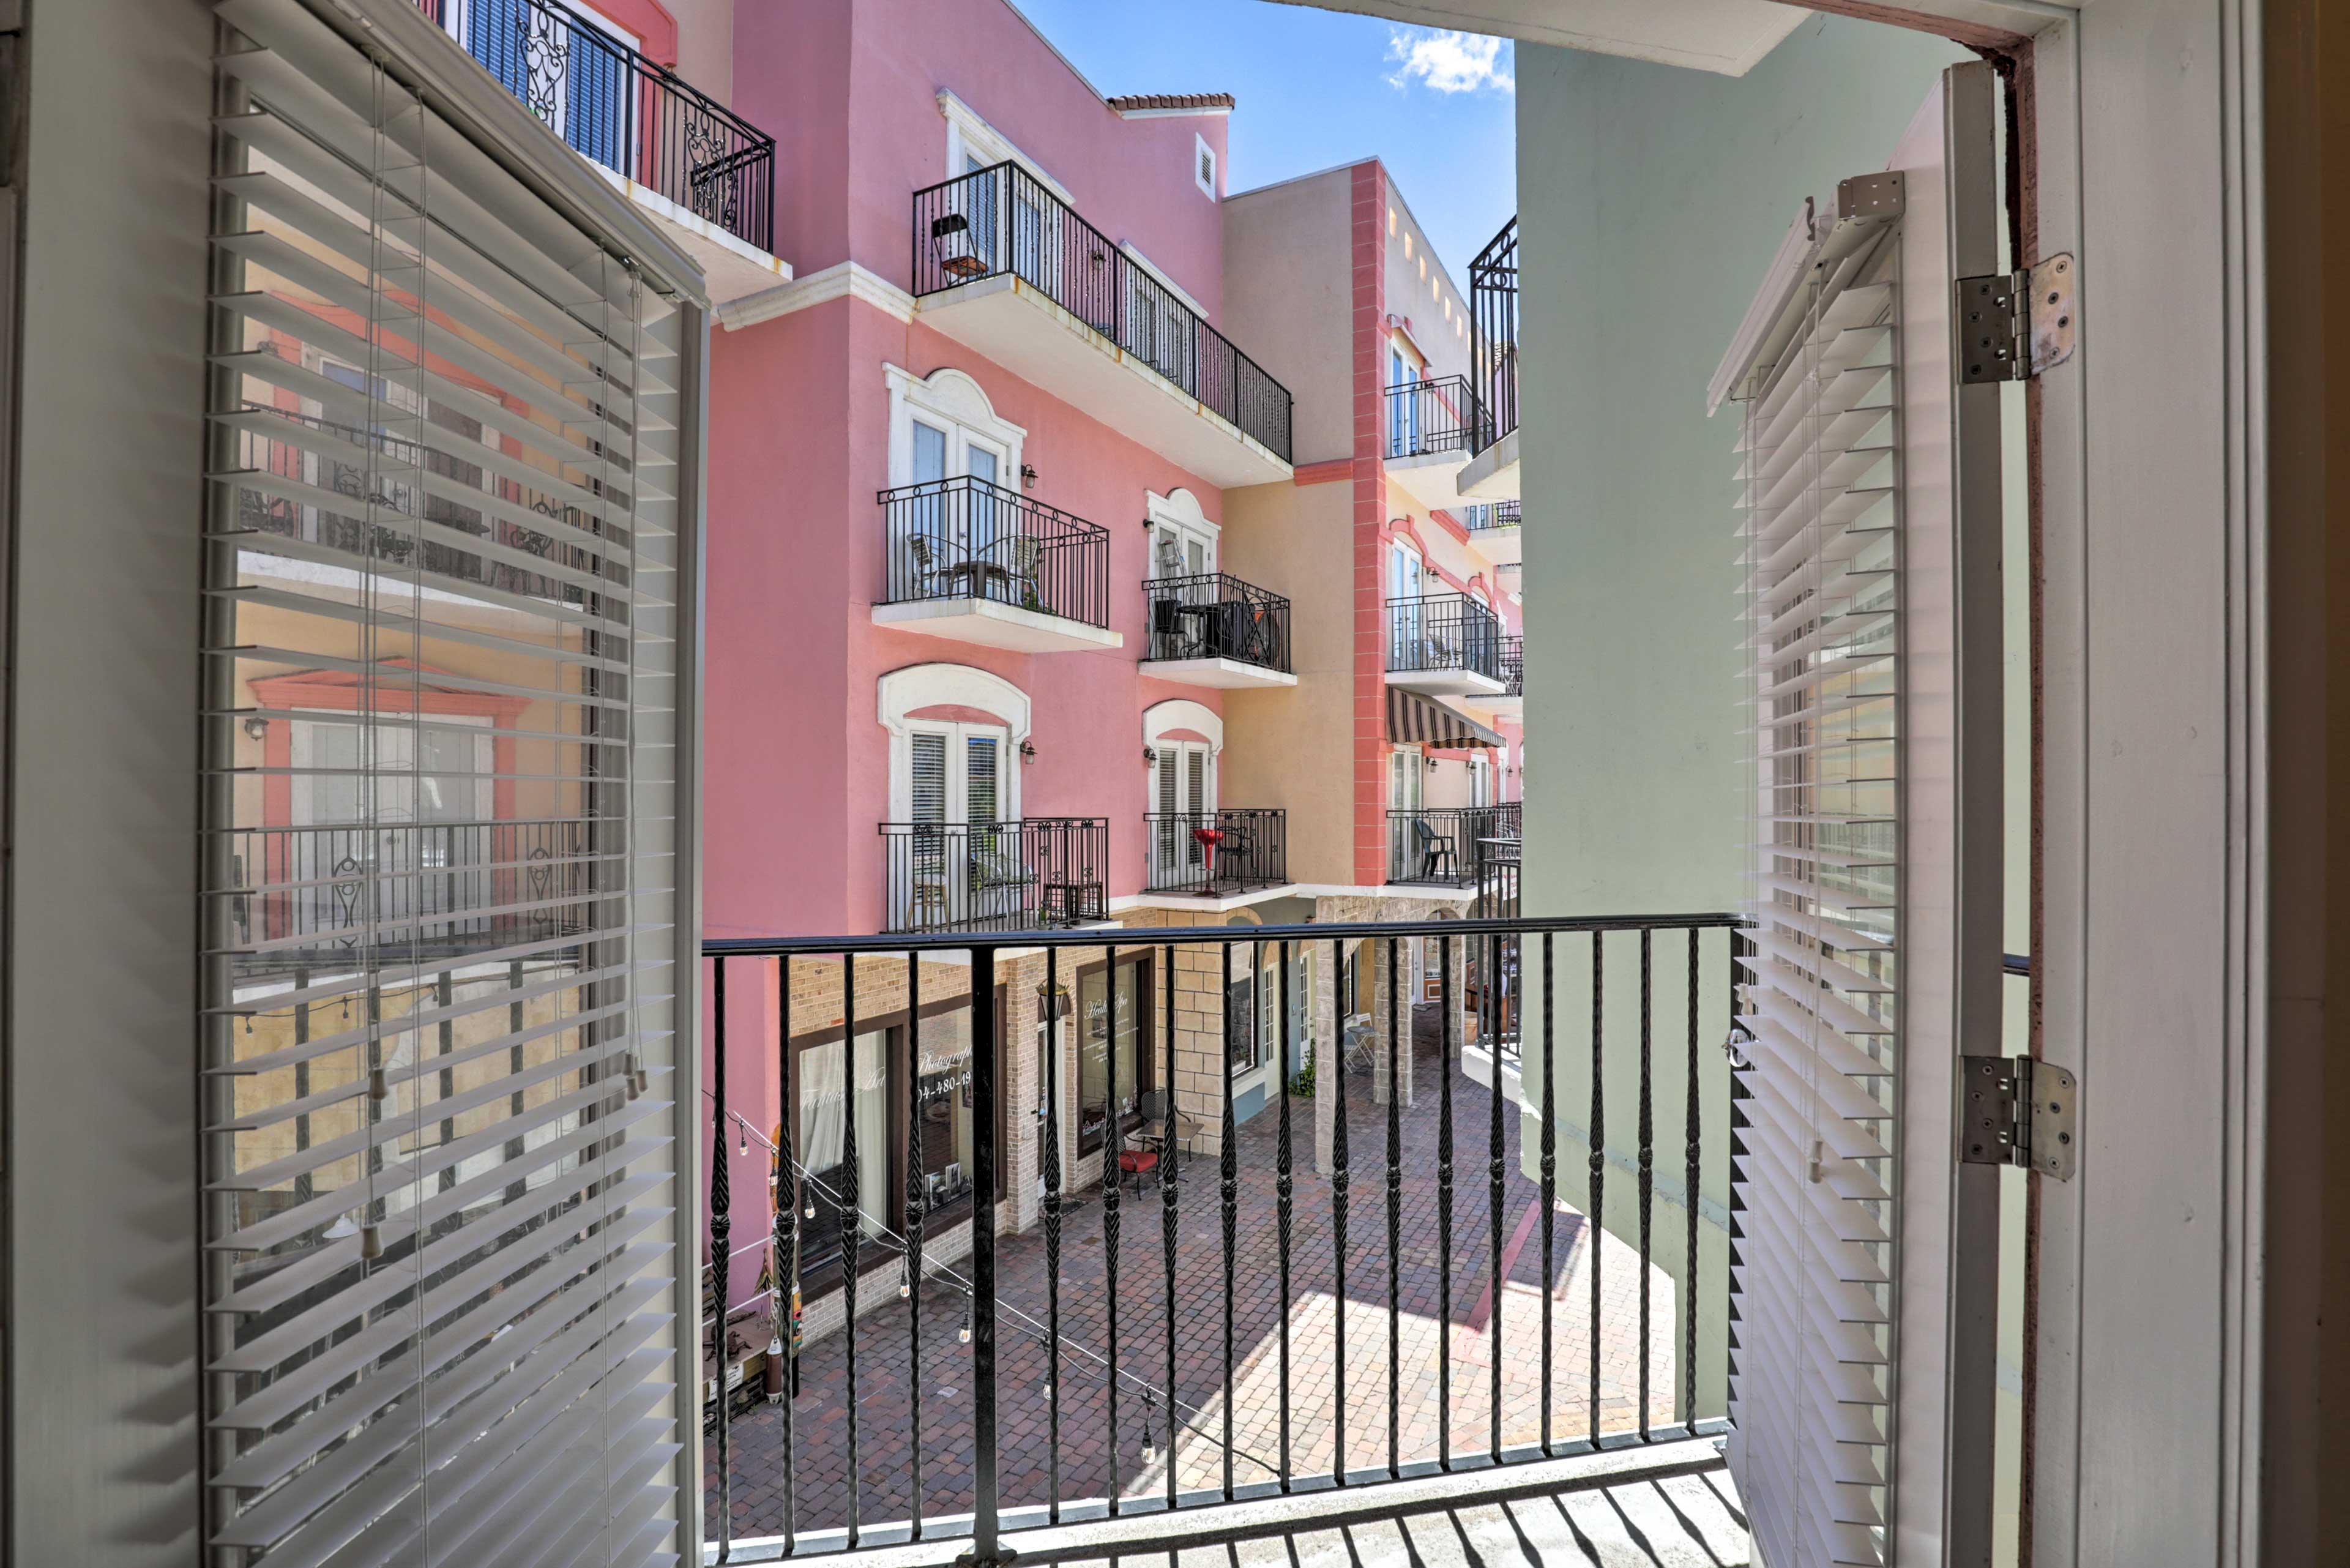 Head onto the balcony and soak up the sun.